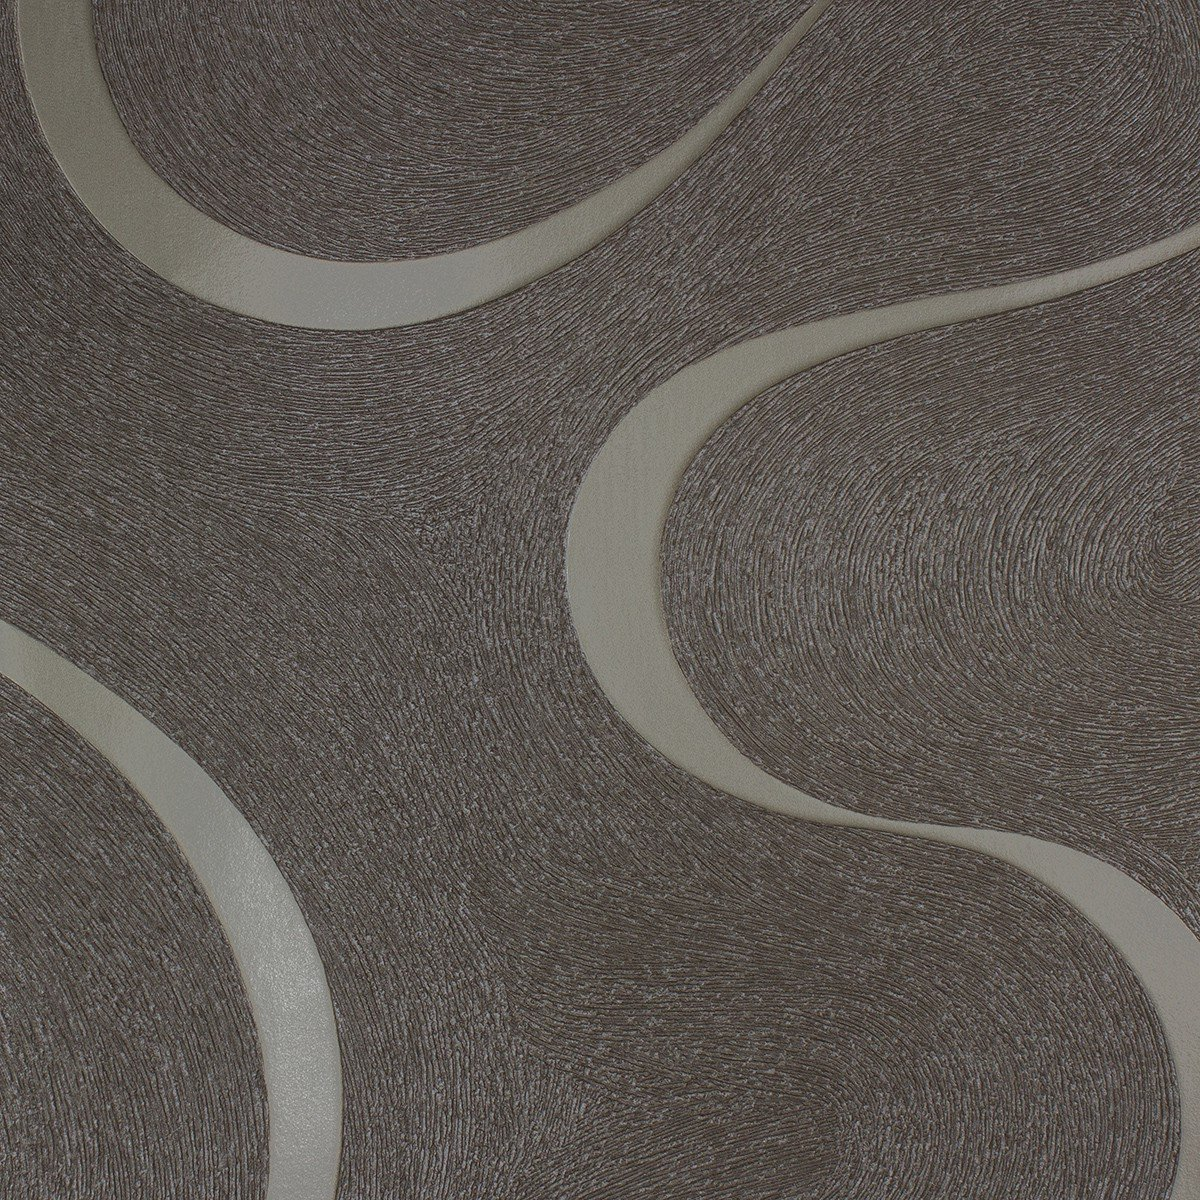 4,67 Luigi Colani Visions Vliestapete Marburg Tapete 53313 Struktur grau silber